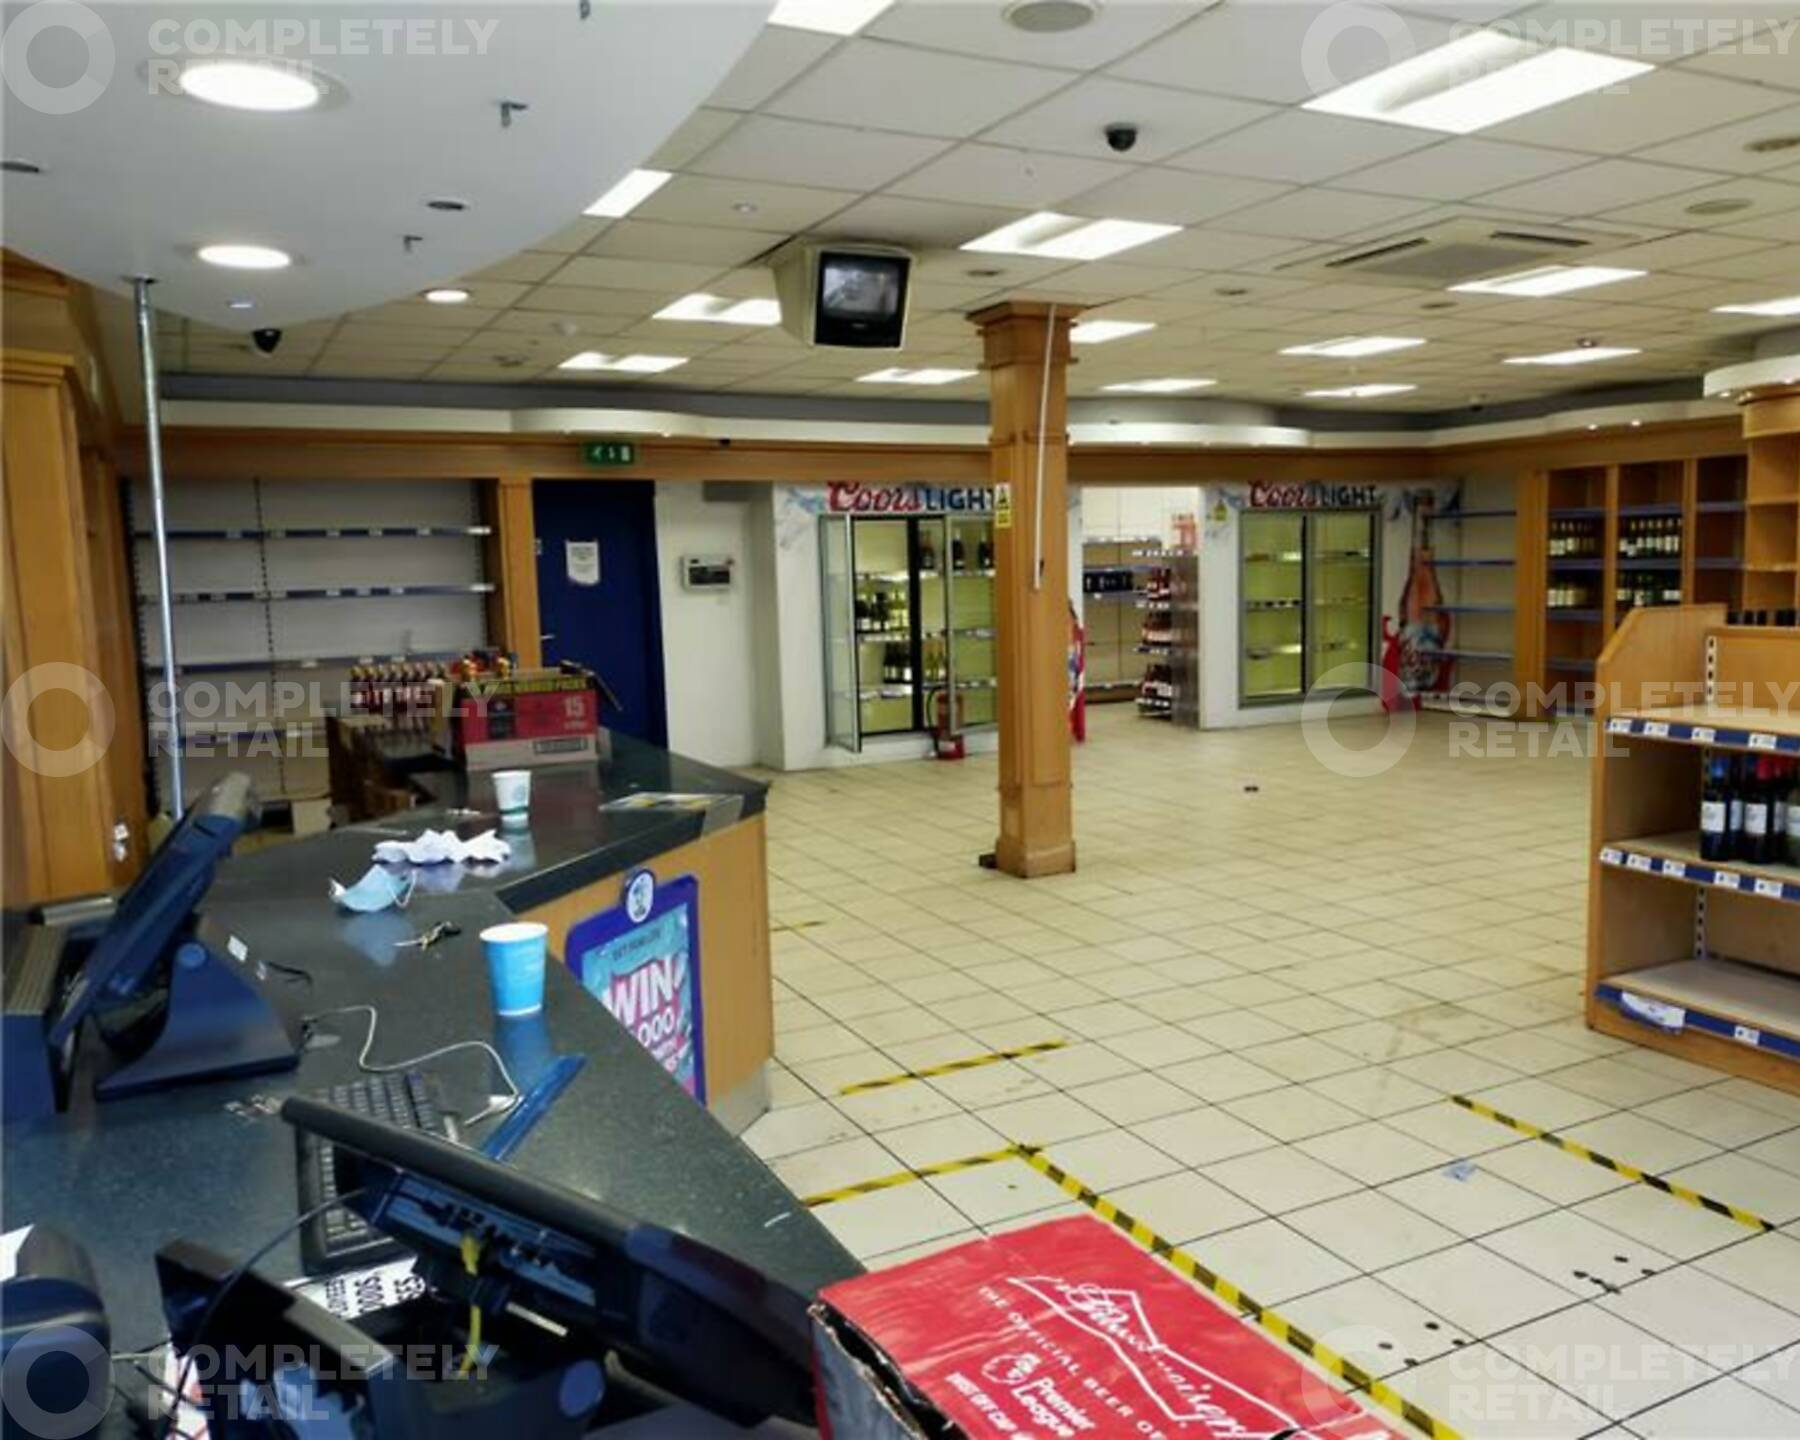 Throne Centre